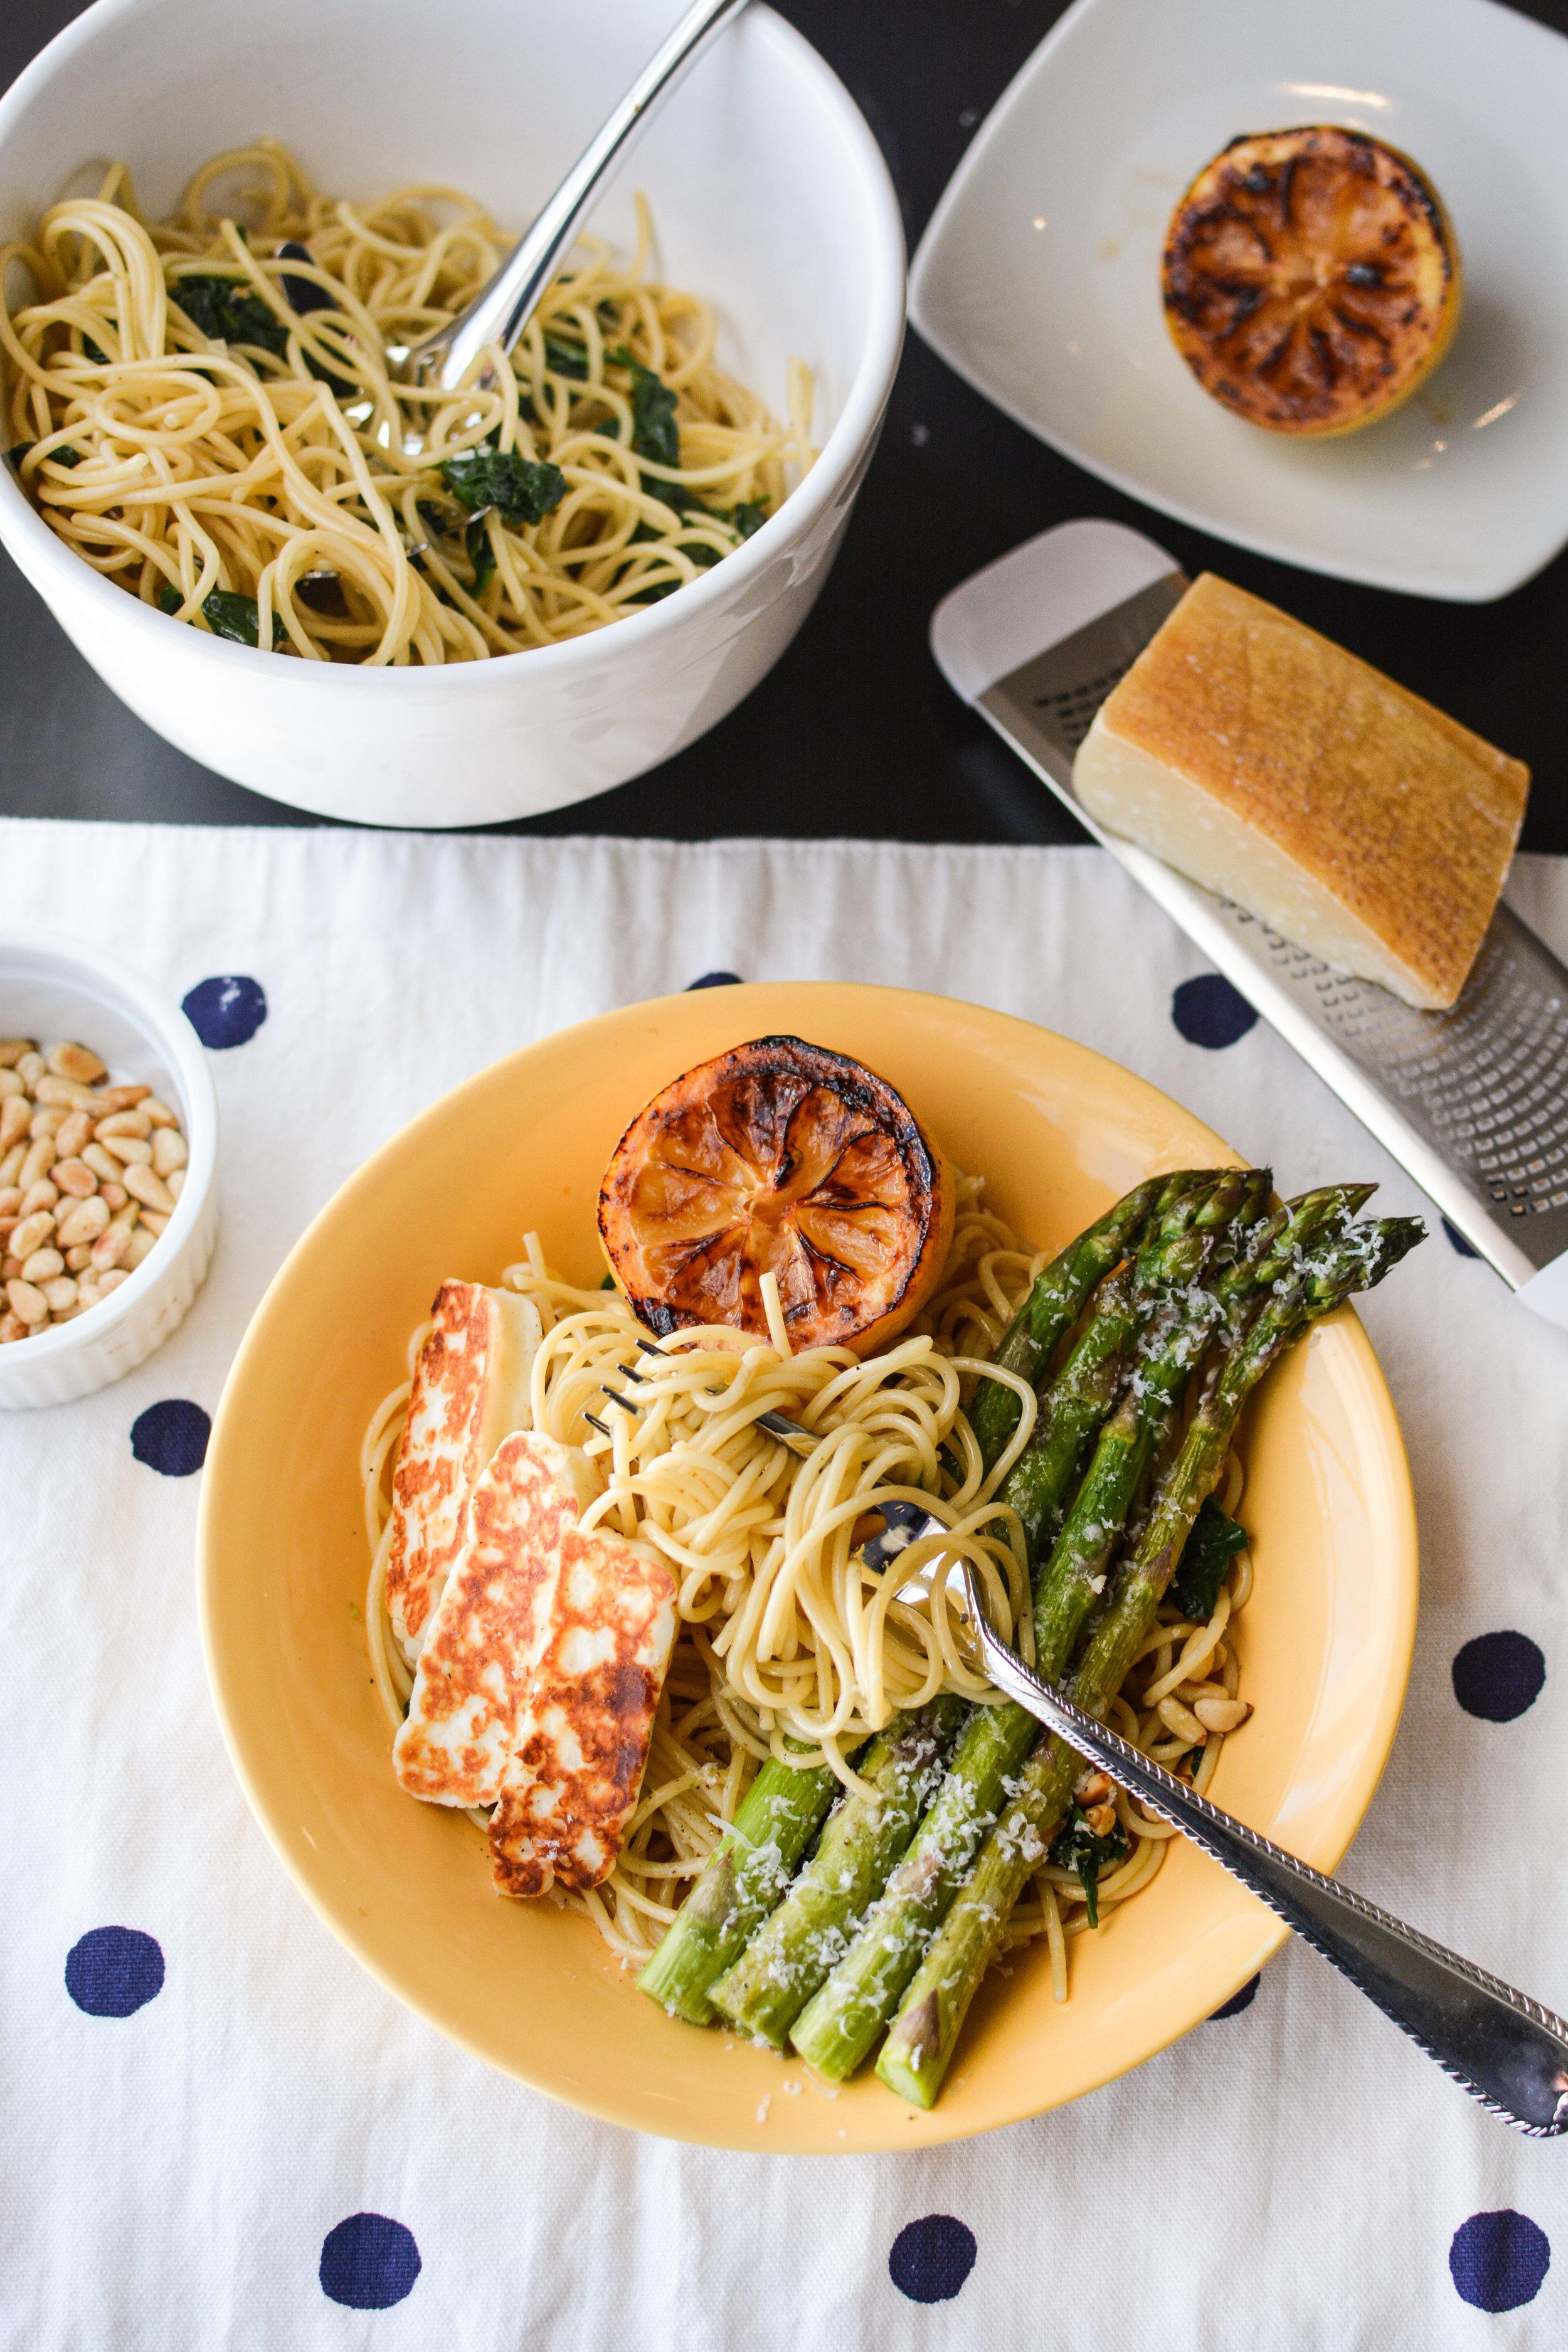 Caramelized Lemon Pasta with Asparagus and Halloumi